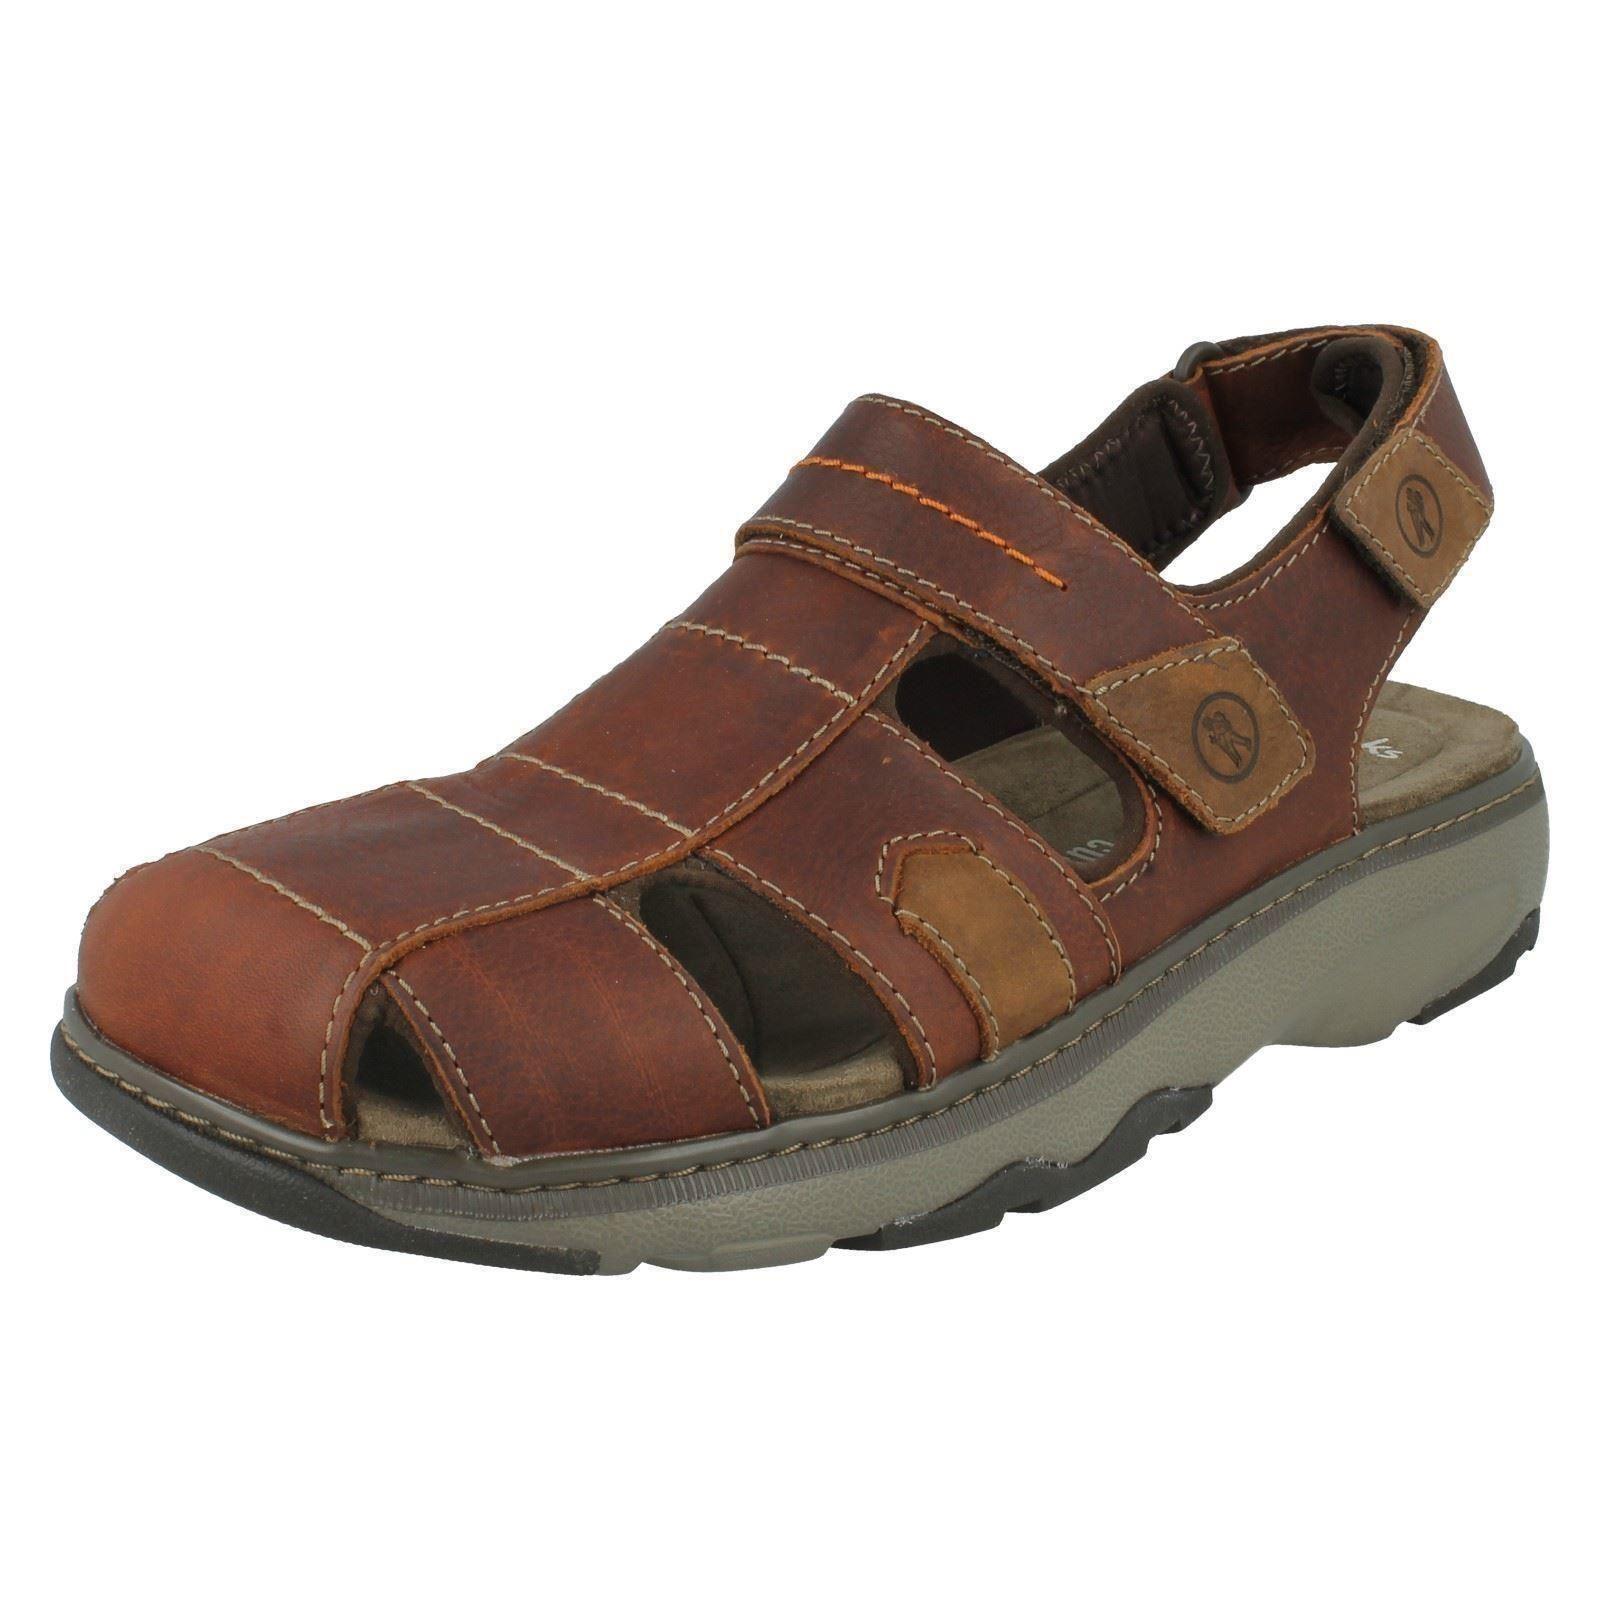 9d280e6a3eea Men s Clarks Enclosed Toe Lightweight Velcro Casual Leather Sandals ...